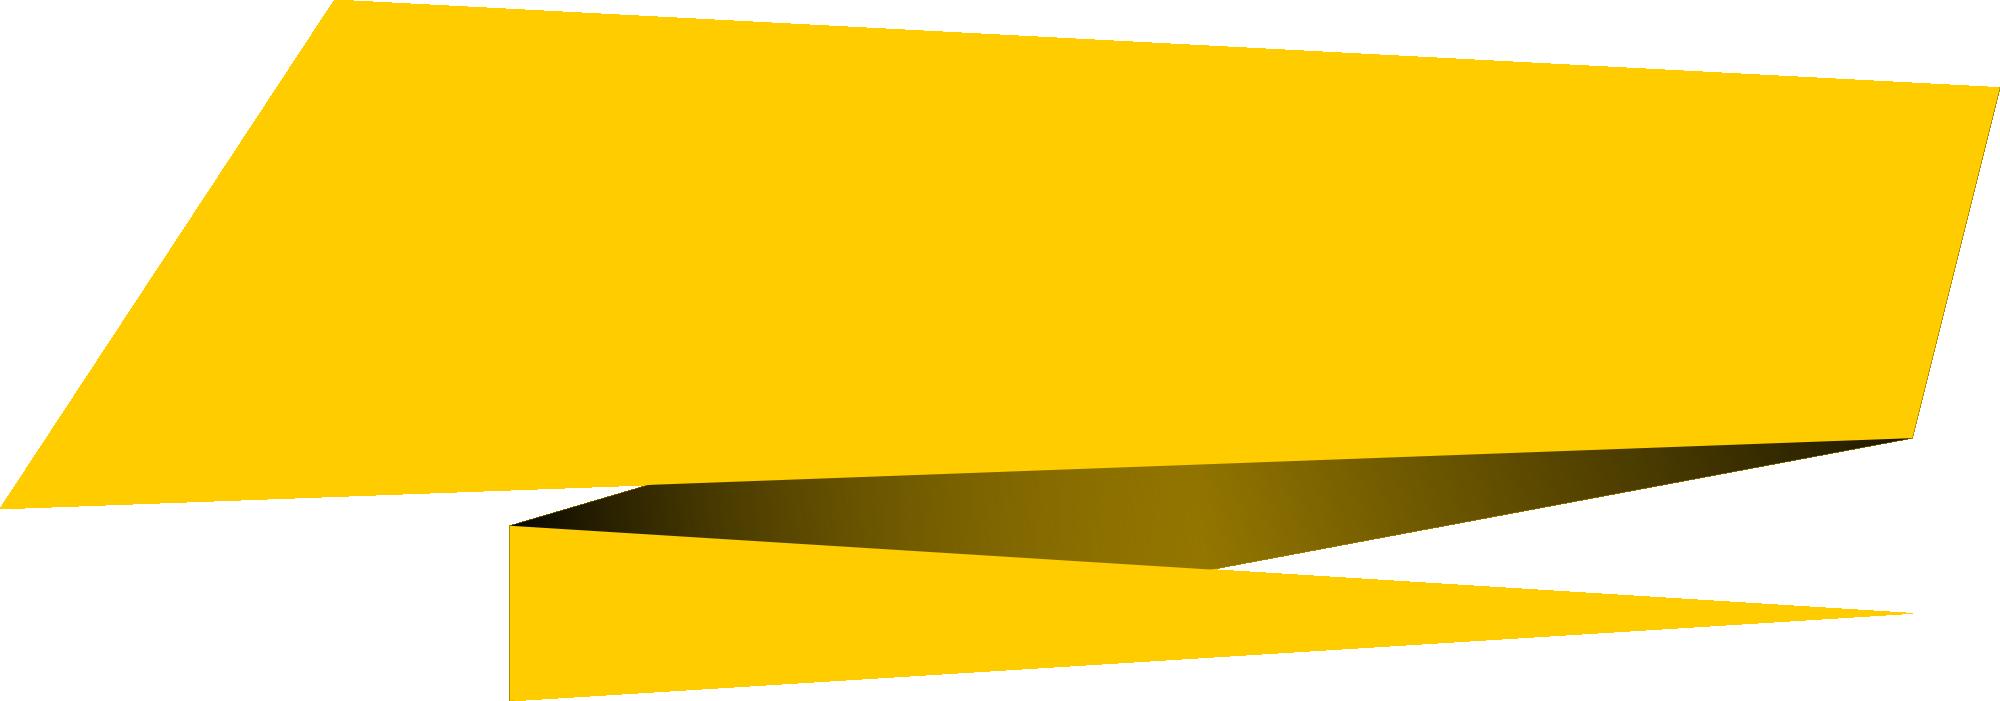 2000x701 Encapsulated Postscript Banner